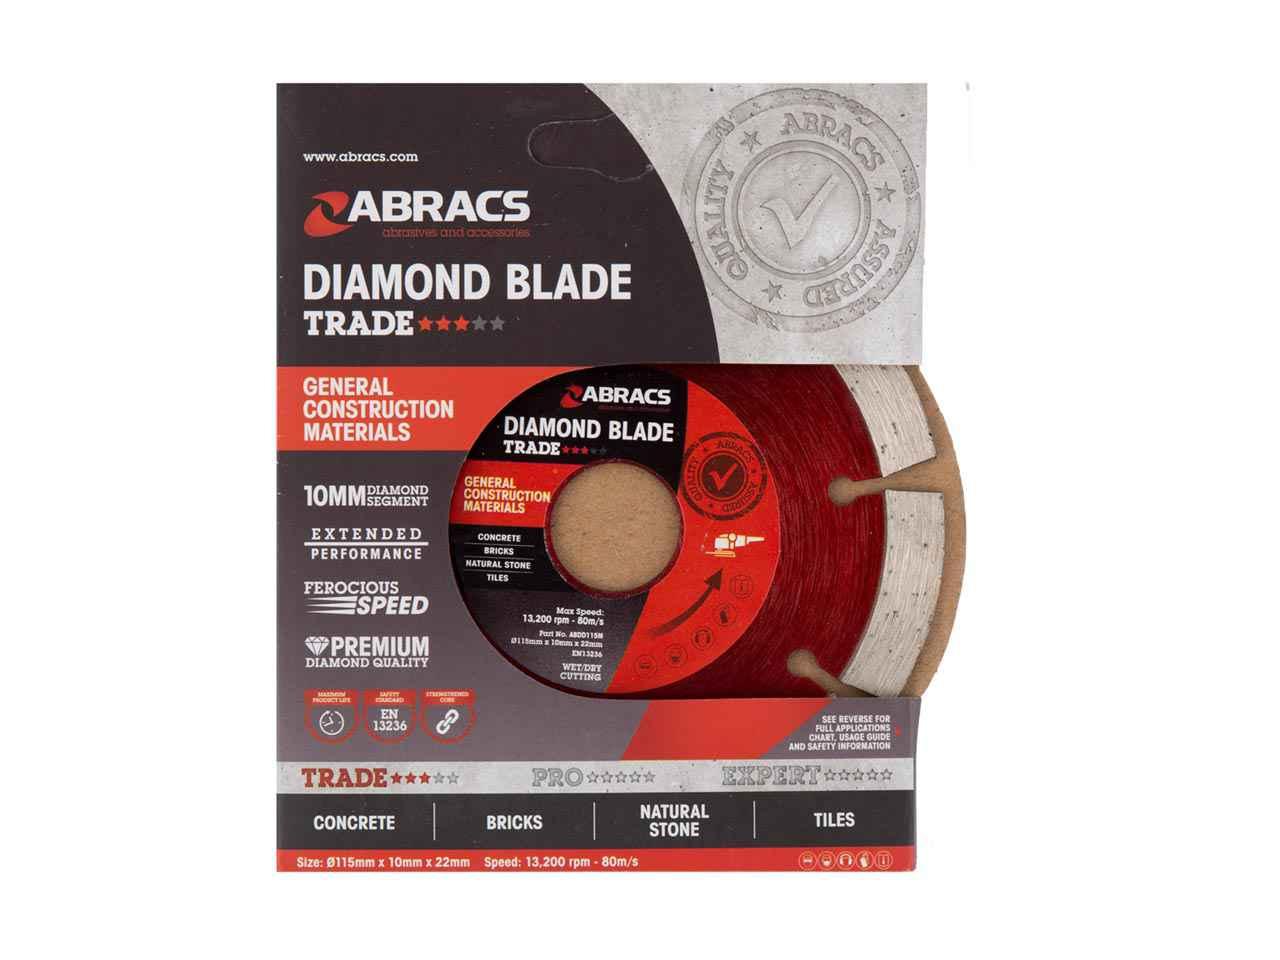 Abracs_ABDD115M-PACK.jpg